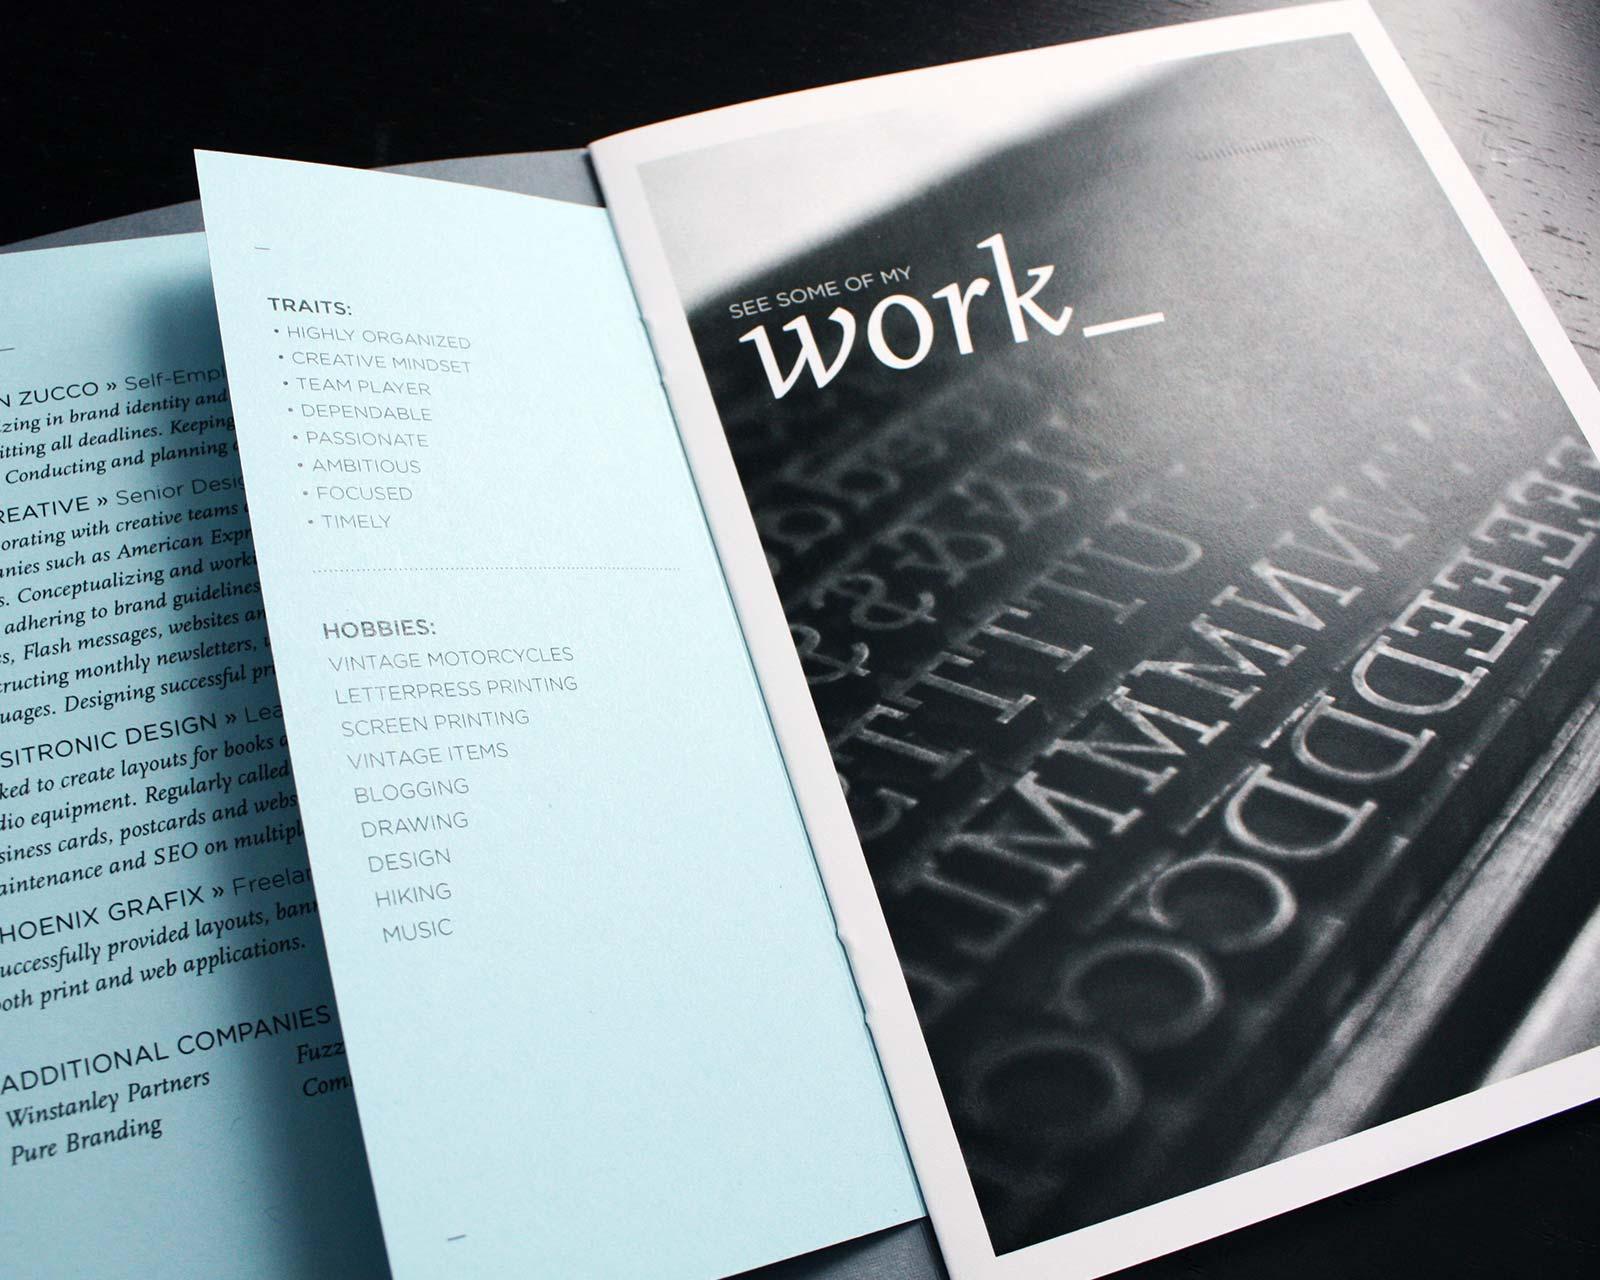 justin-zucco-self-promo-book-2.jpg